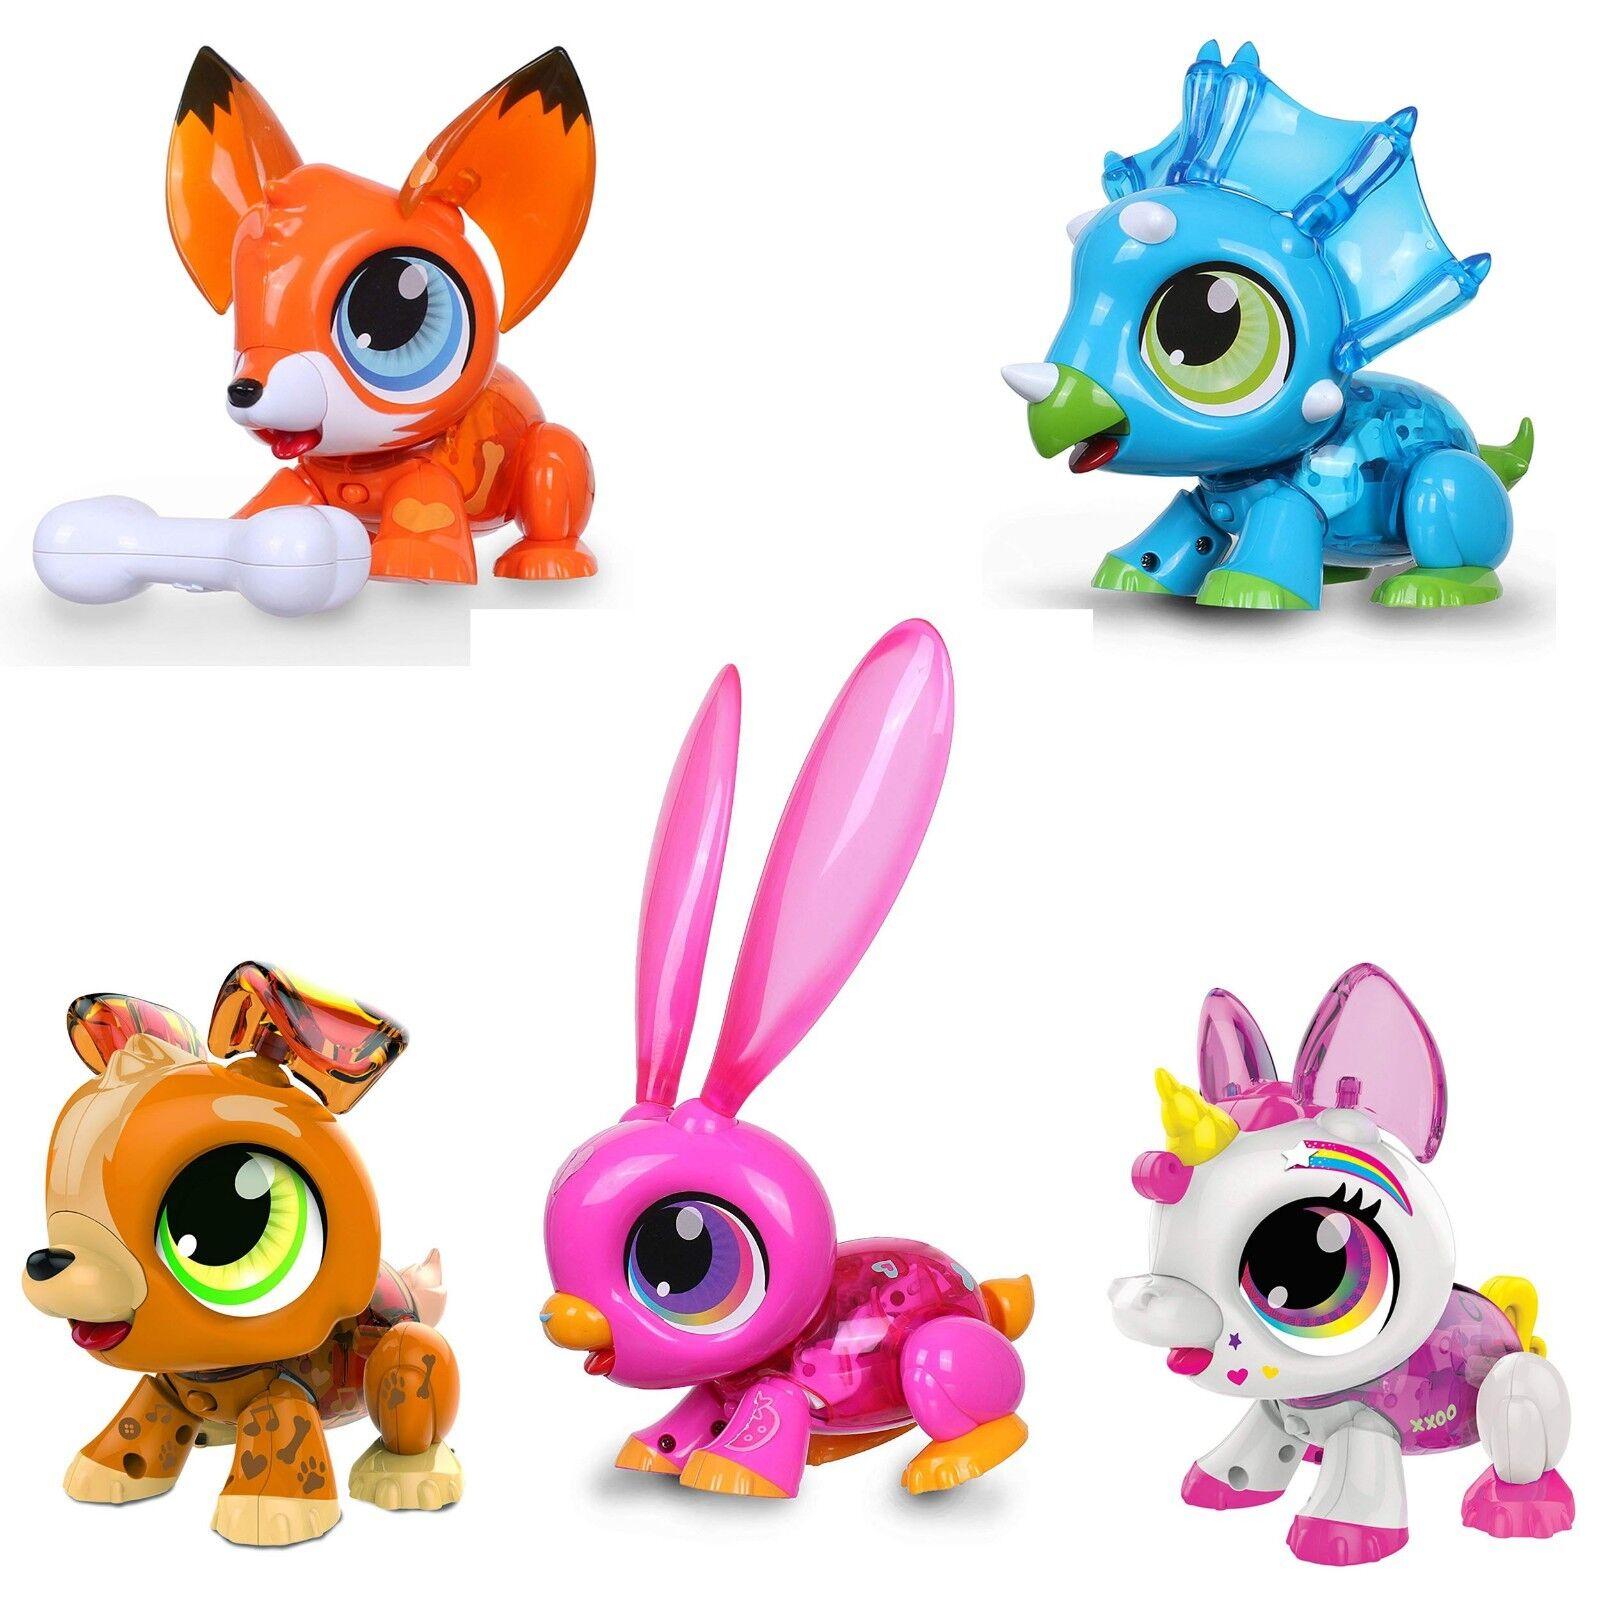 Build a Bot - Build a Robot Pet - Bunny, Fox, Unicorn, Puppy or Dino NEW 2018